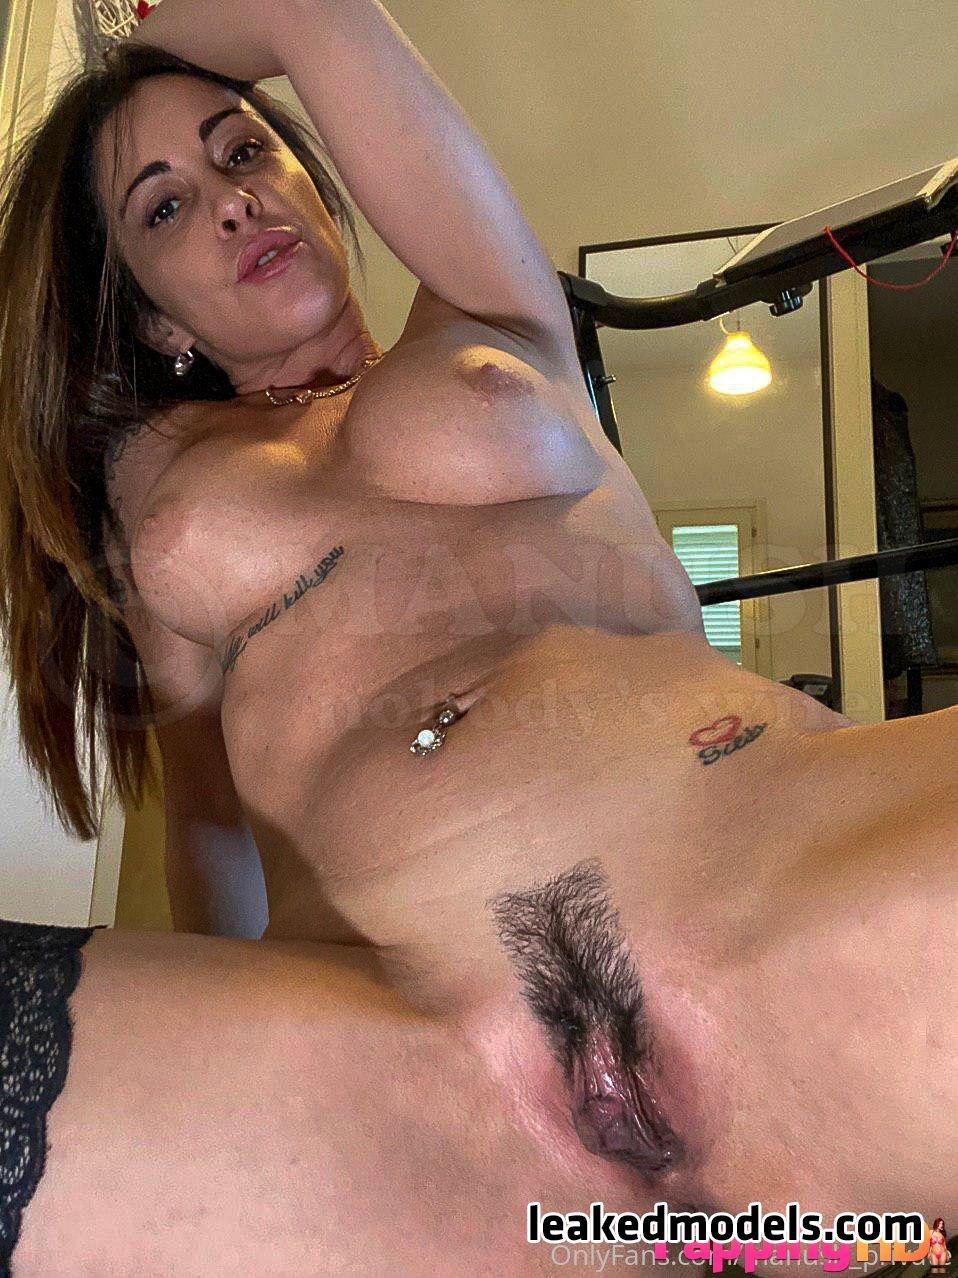 Manush OnlyFans Nude Leaks (30 Photos)